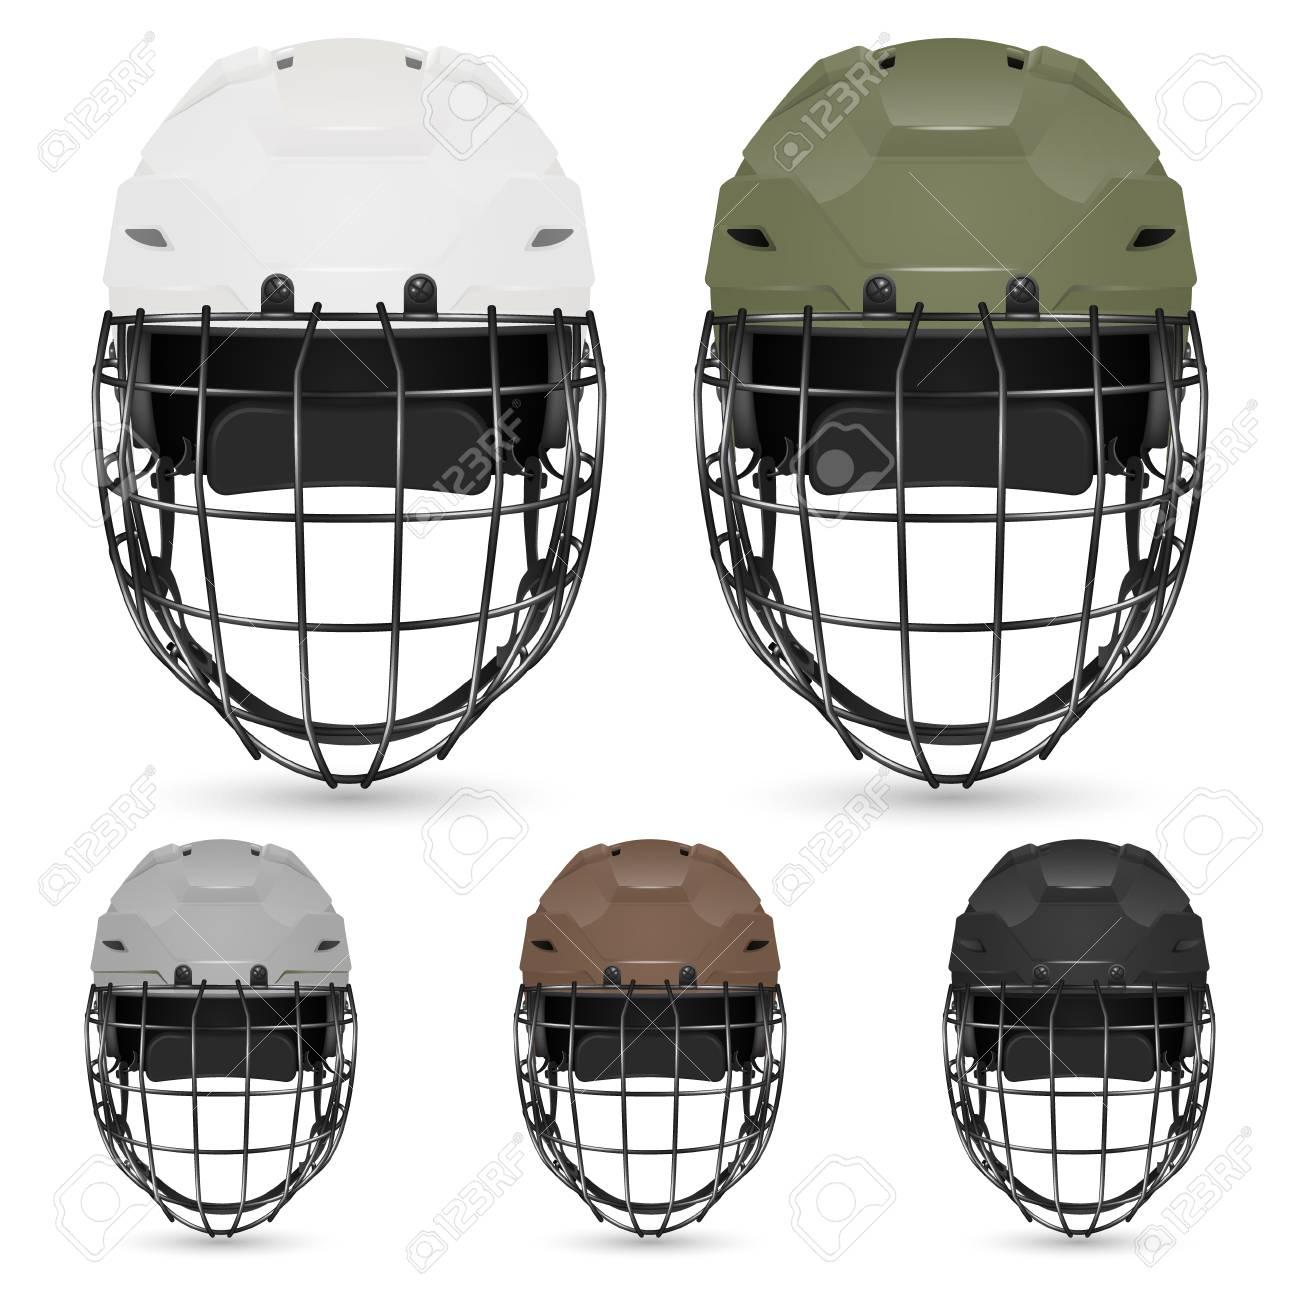 4ec0b8fa Set of goalkeeper hockey helmets, isolated. Vector illustration. Stock  Vector - 39266129